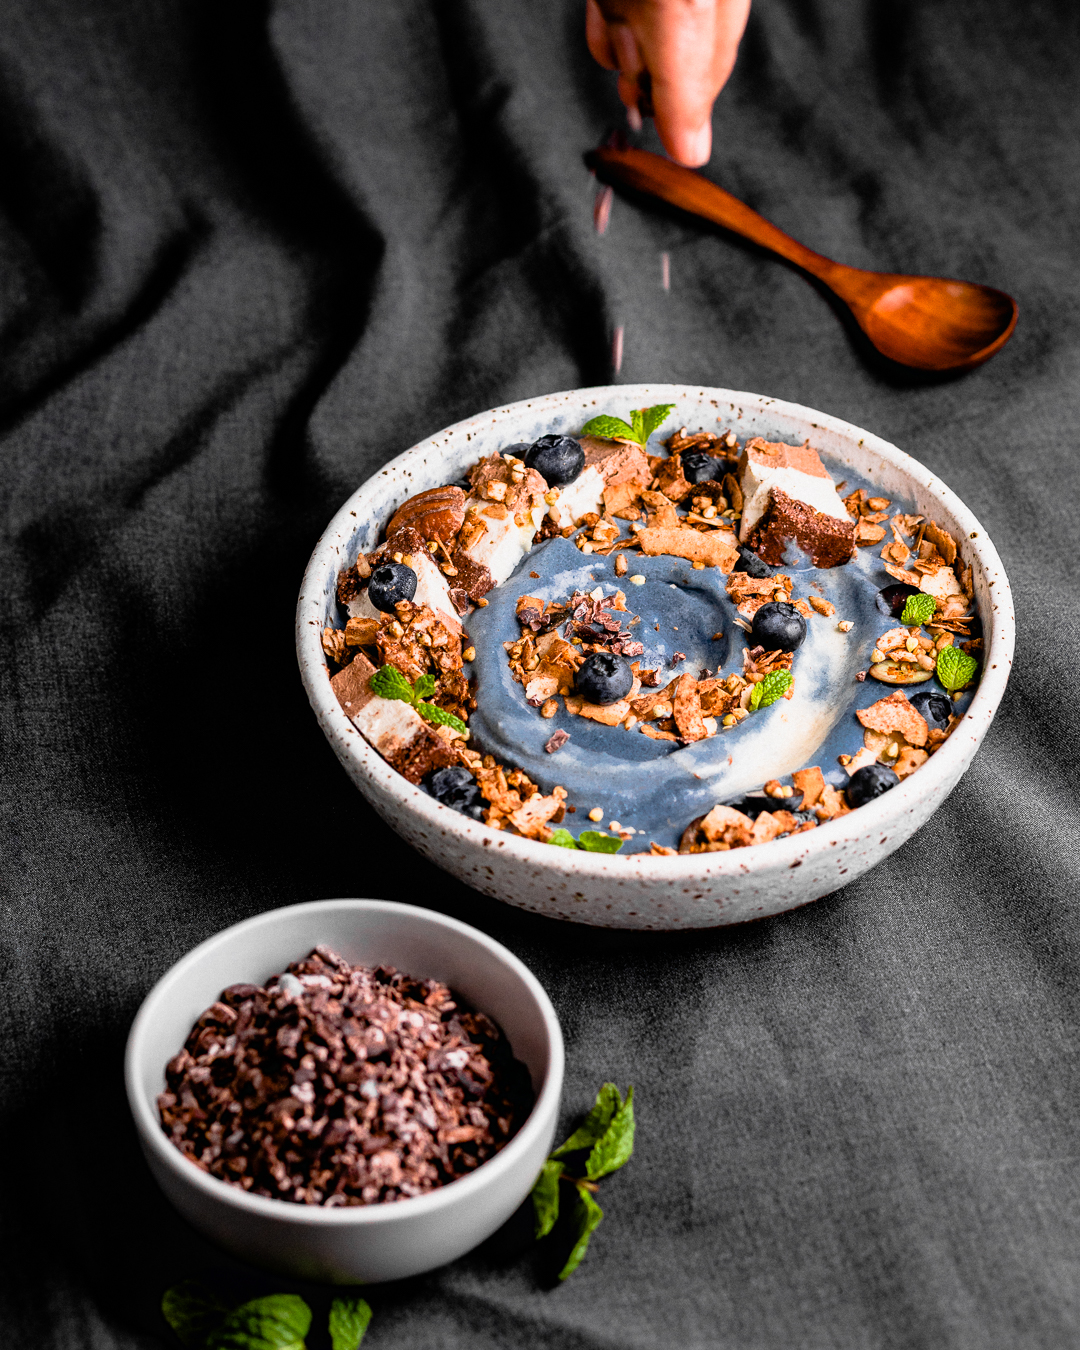 Banana_and_Coconut_Blue_Smoothy_Bowl__portrait_by_Jordan_Pie_Nutritionist_Photographer-2.jpg